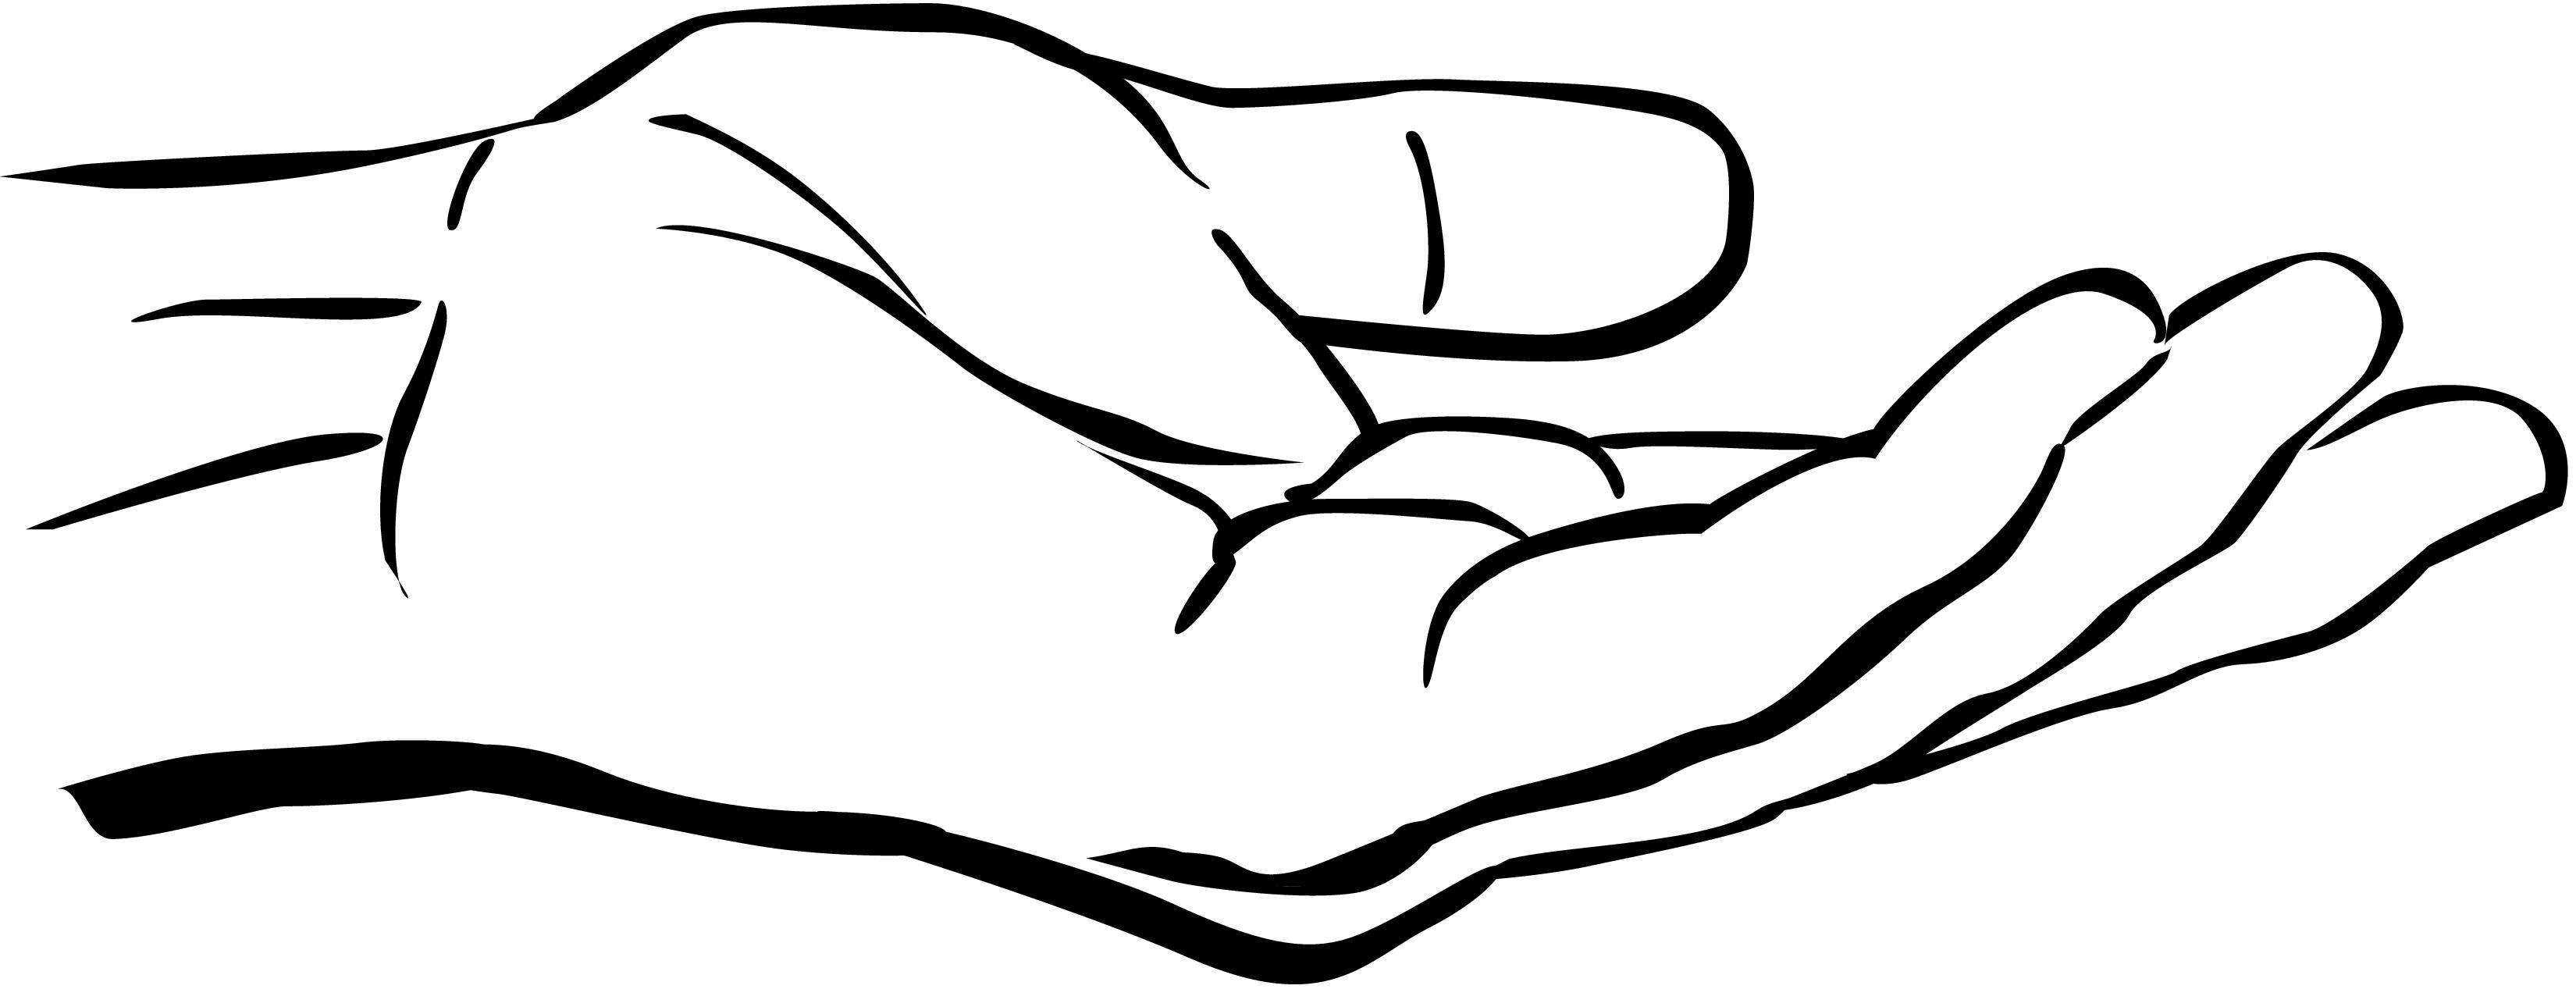 3300x1267 Free Clip Art Hands